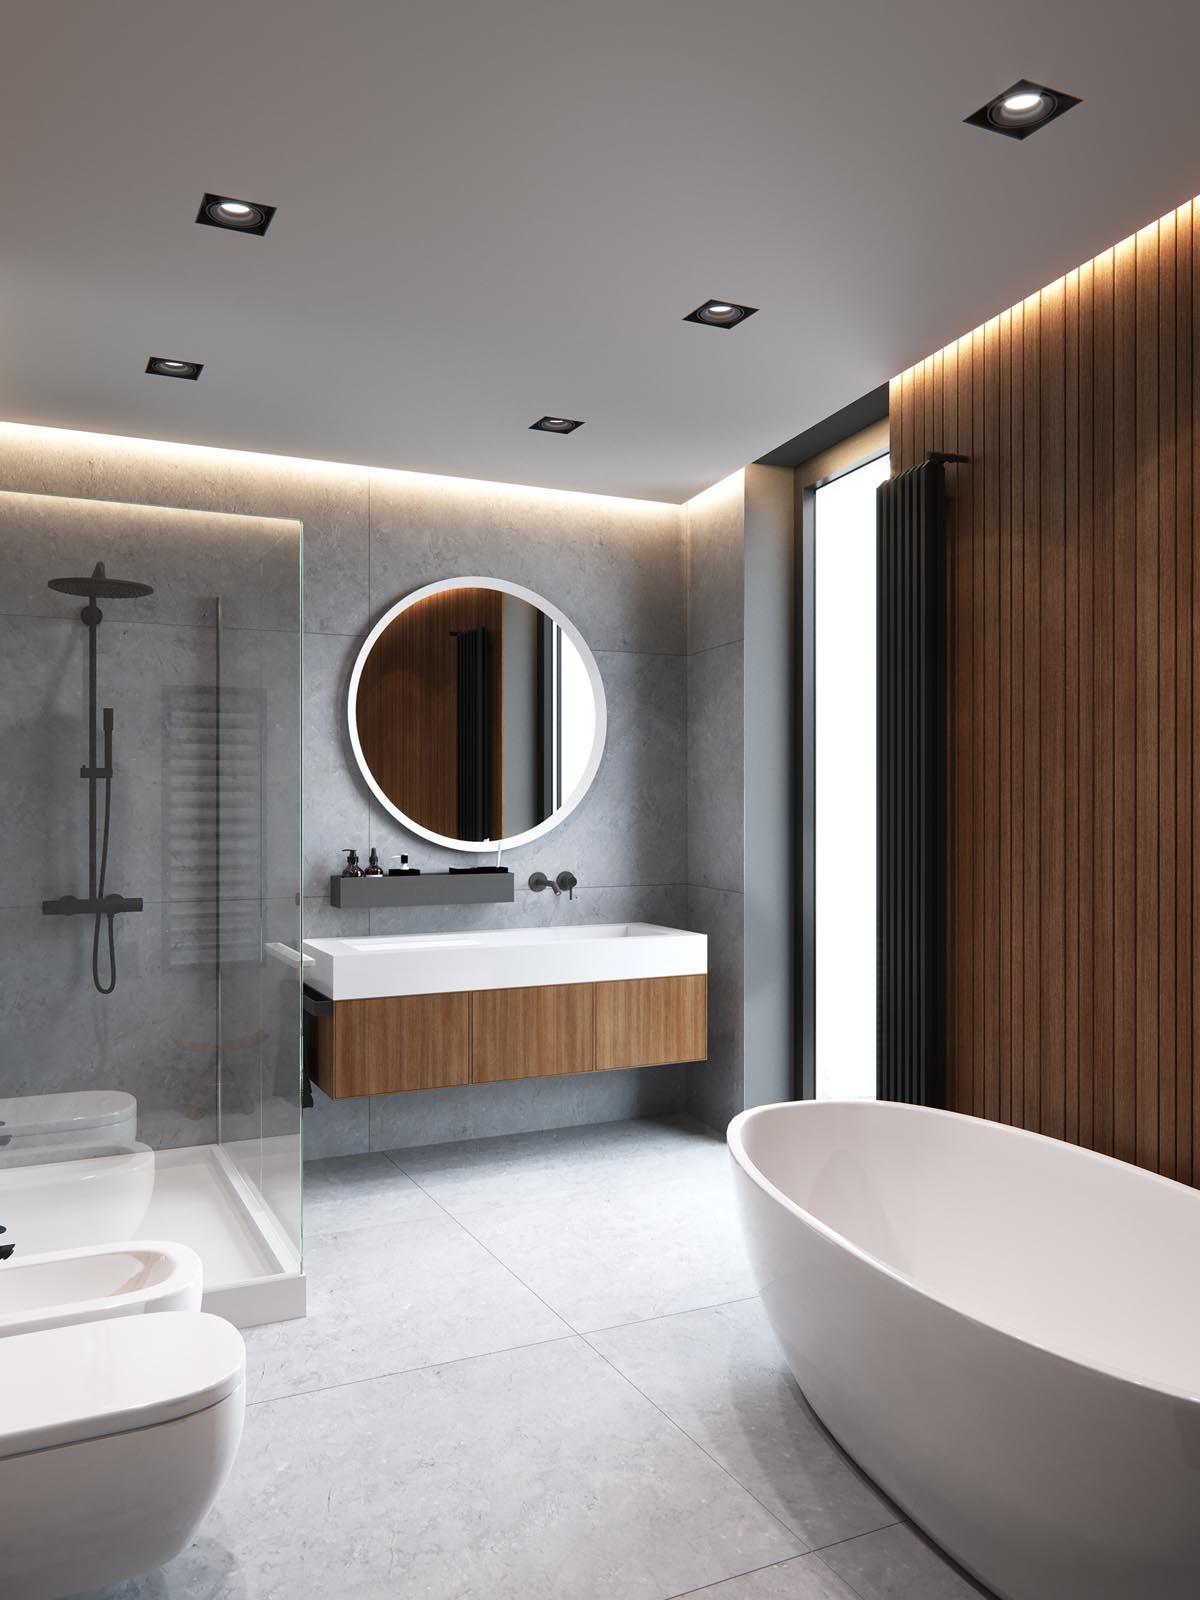 A Sleek Modern Home For A Stylish Young Family Minimalist Bathroom Minimalist Bathroom Design Top Bathroom Design